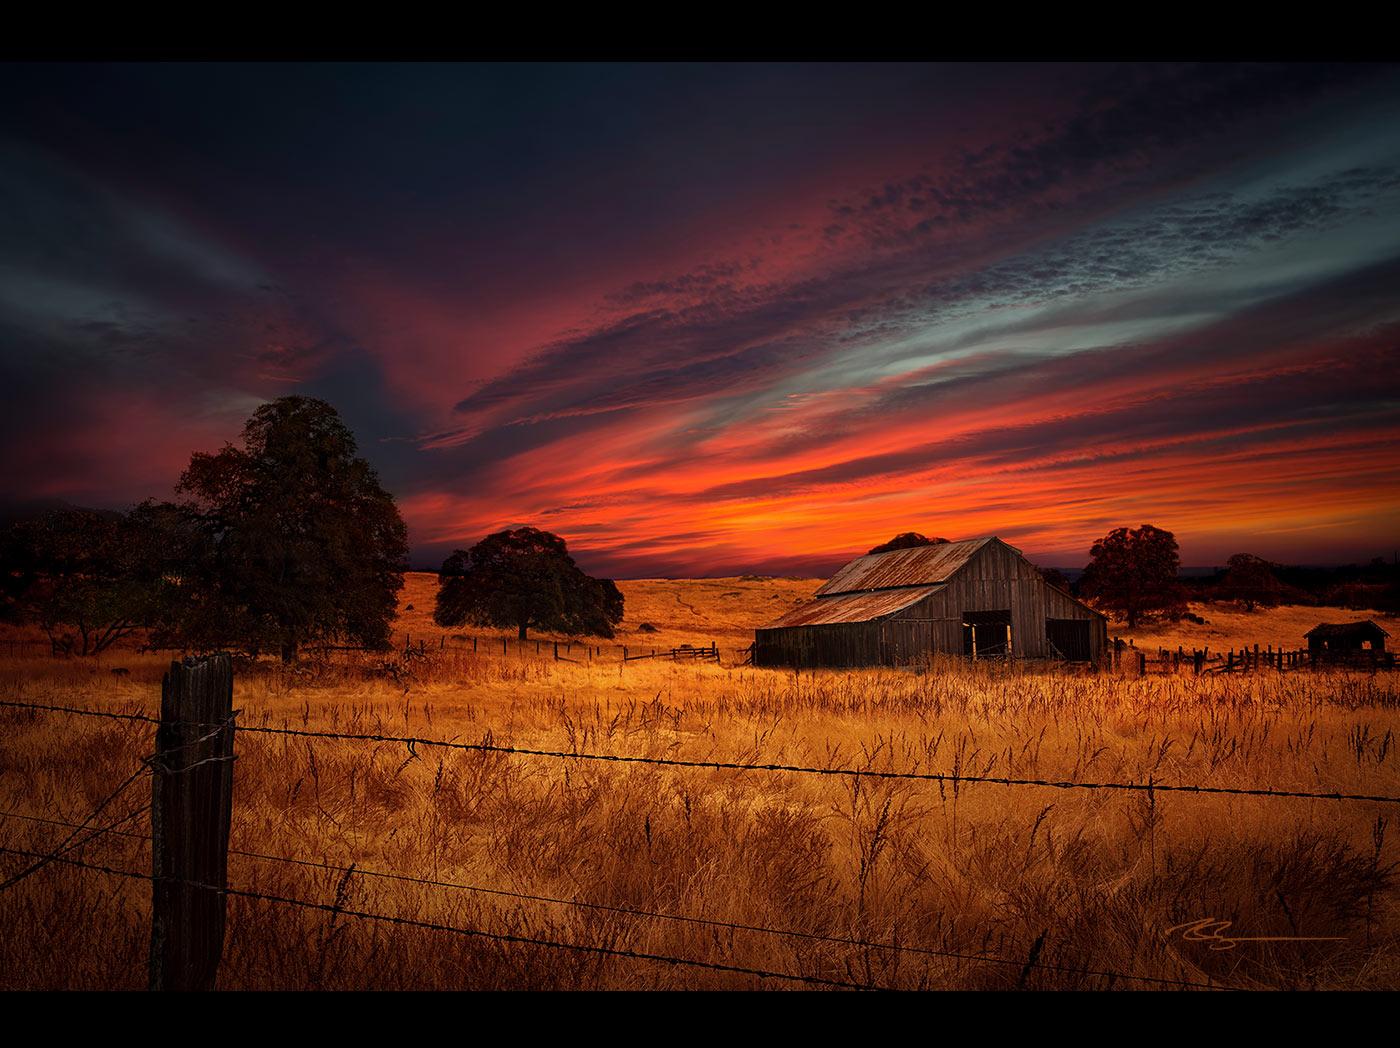 Hd wallpaper mountain - Montana Barn Sunset Home 1400 72h Ryan Buchanan Photography